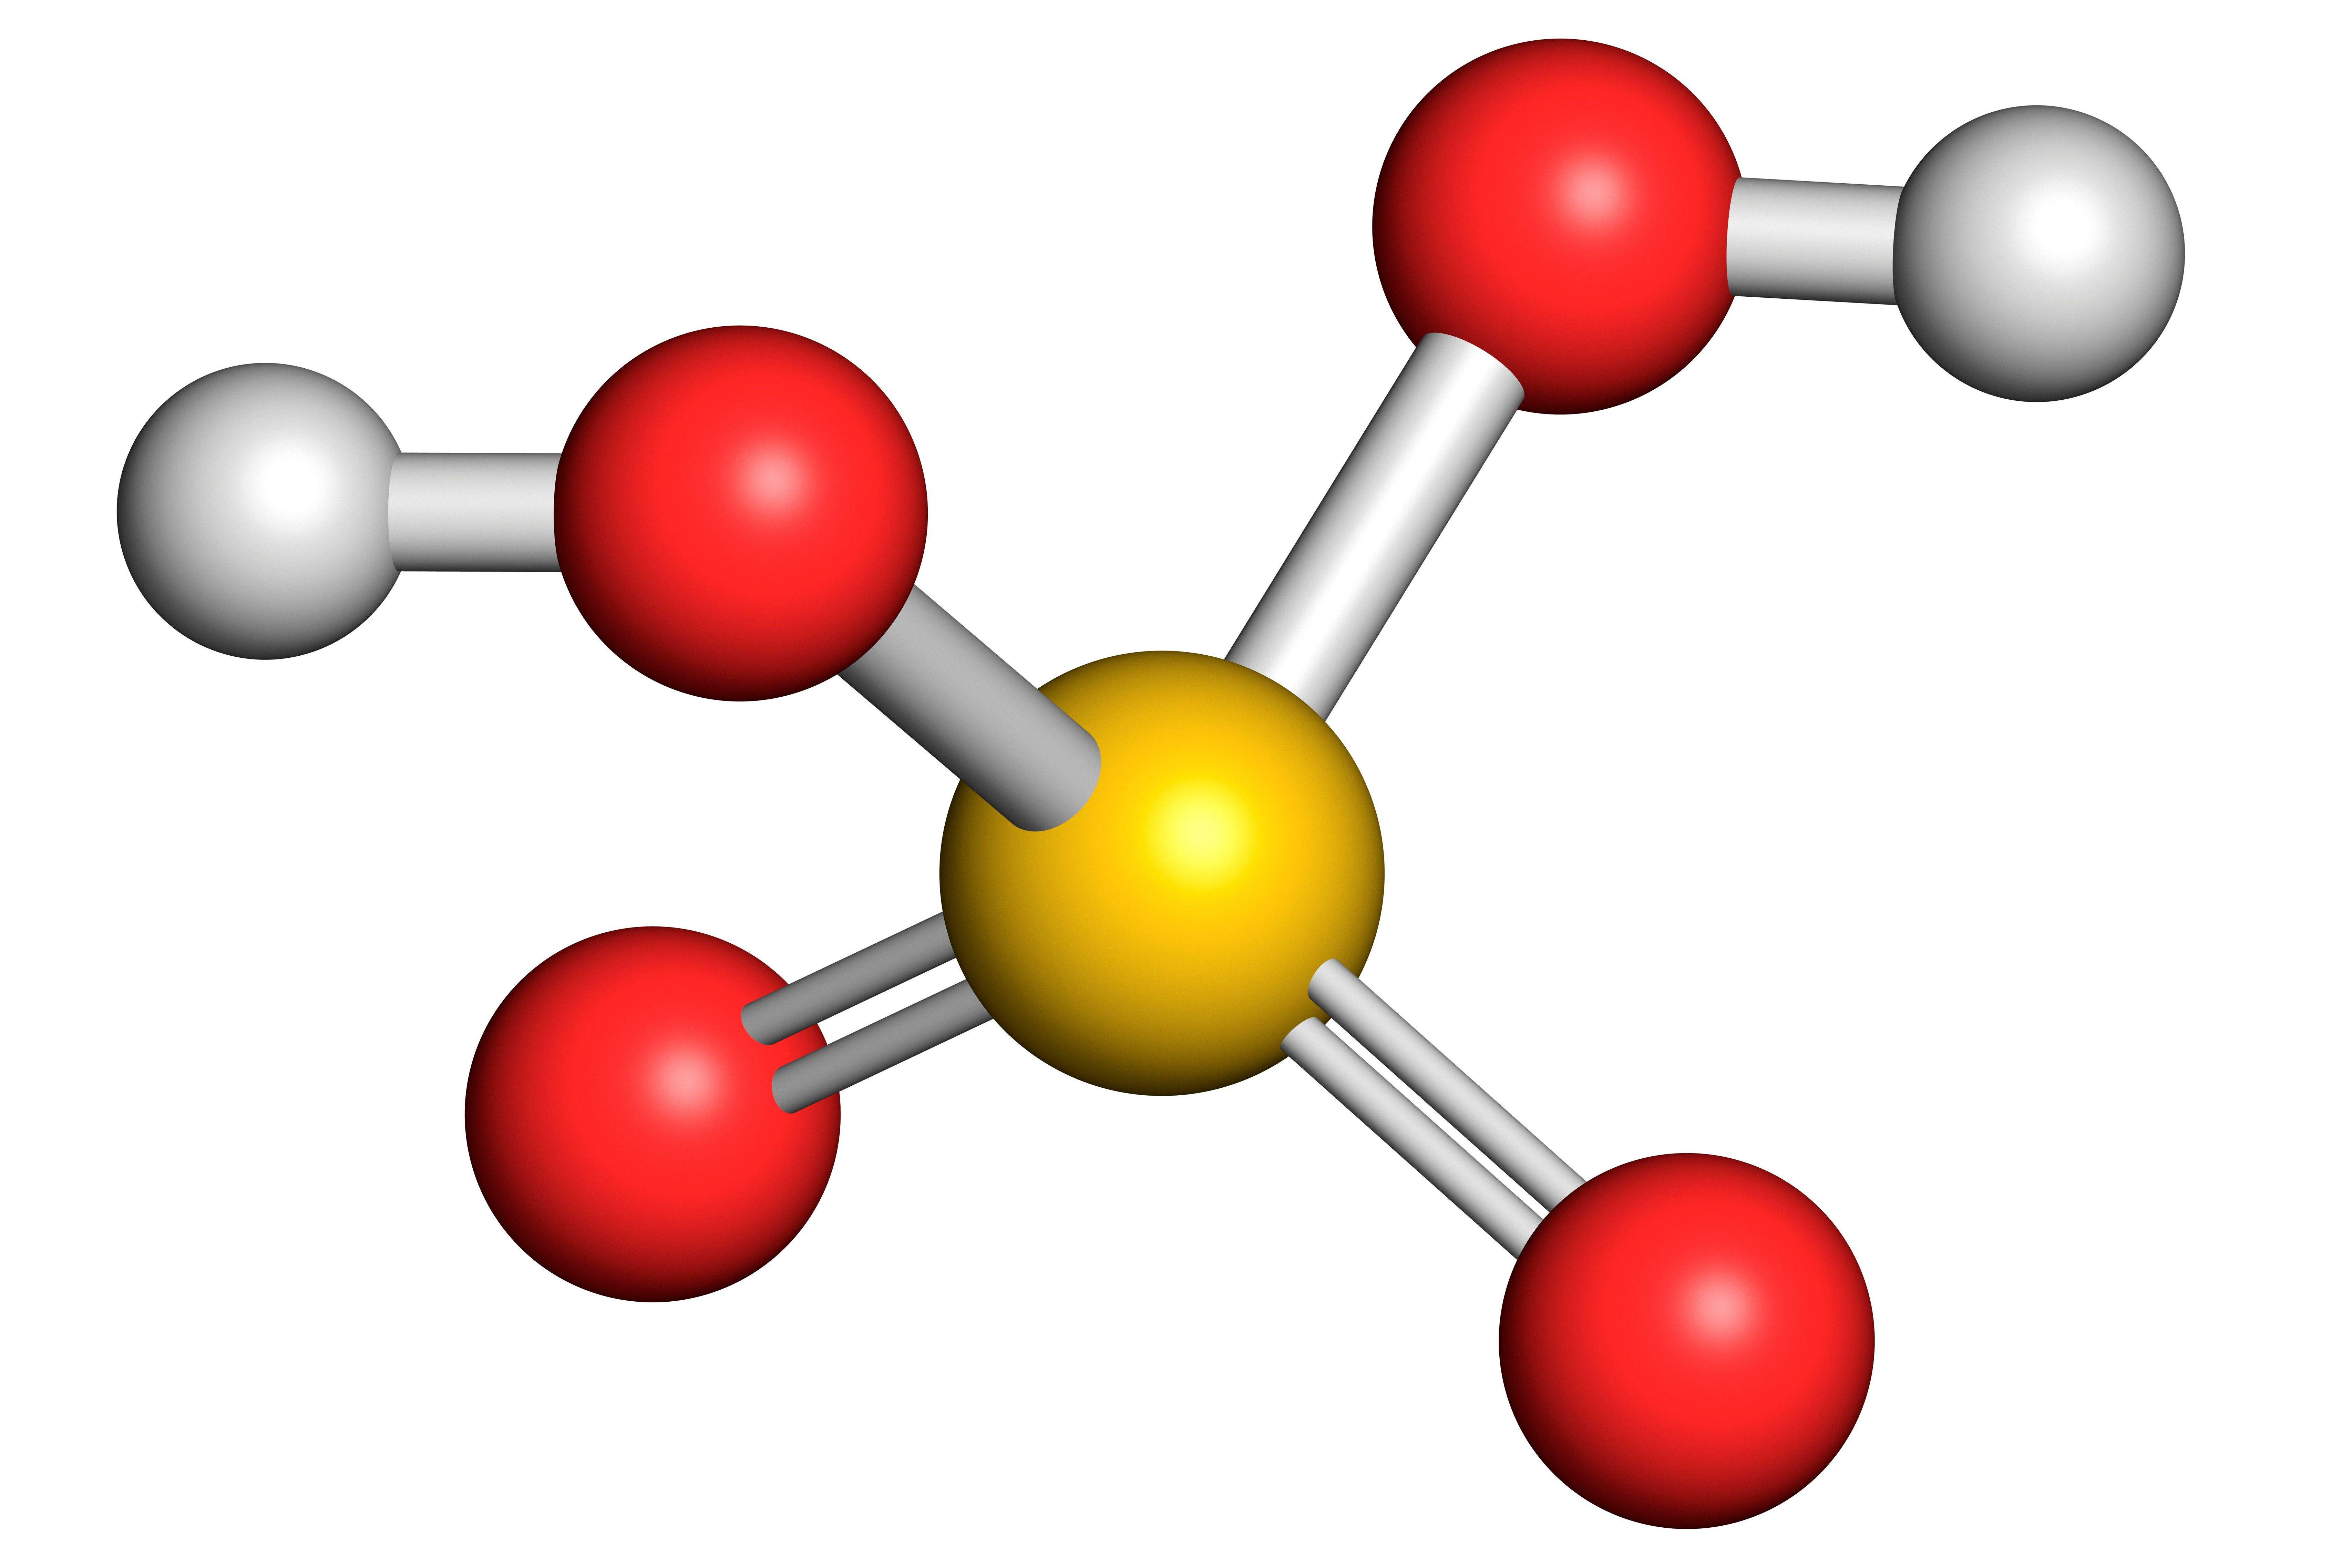 Model of sulfuric acid